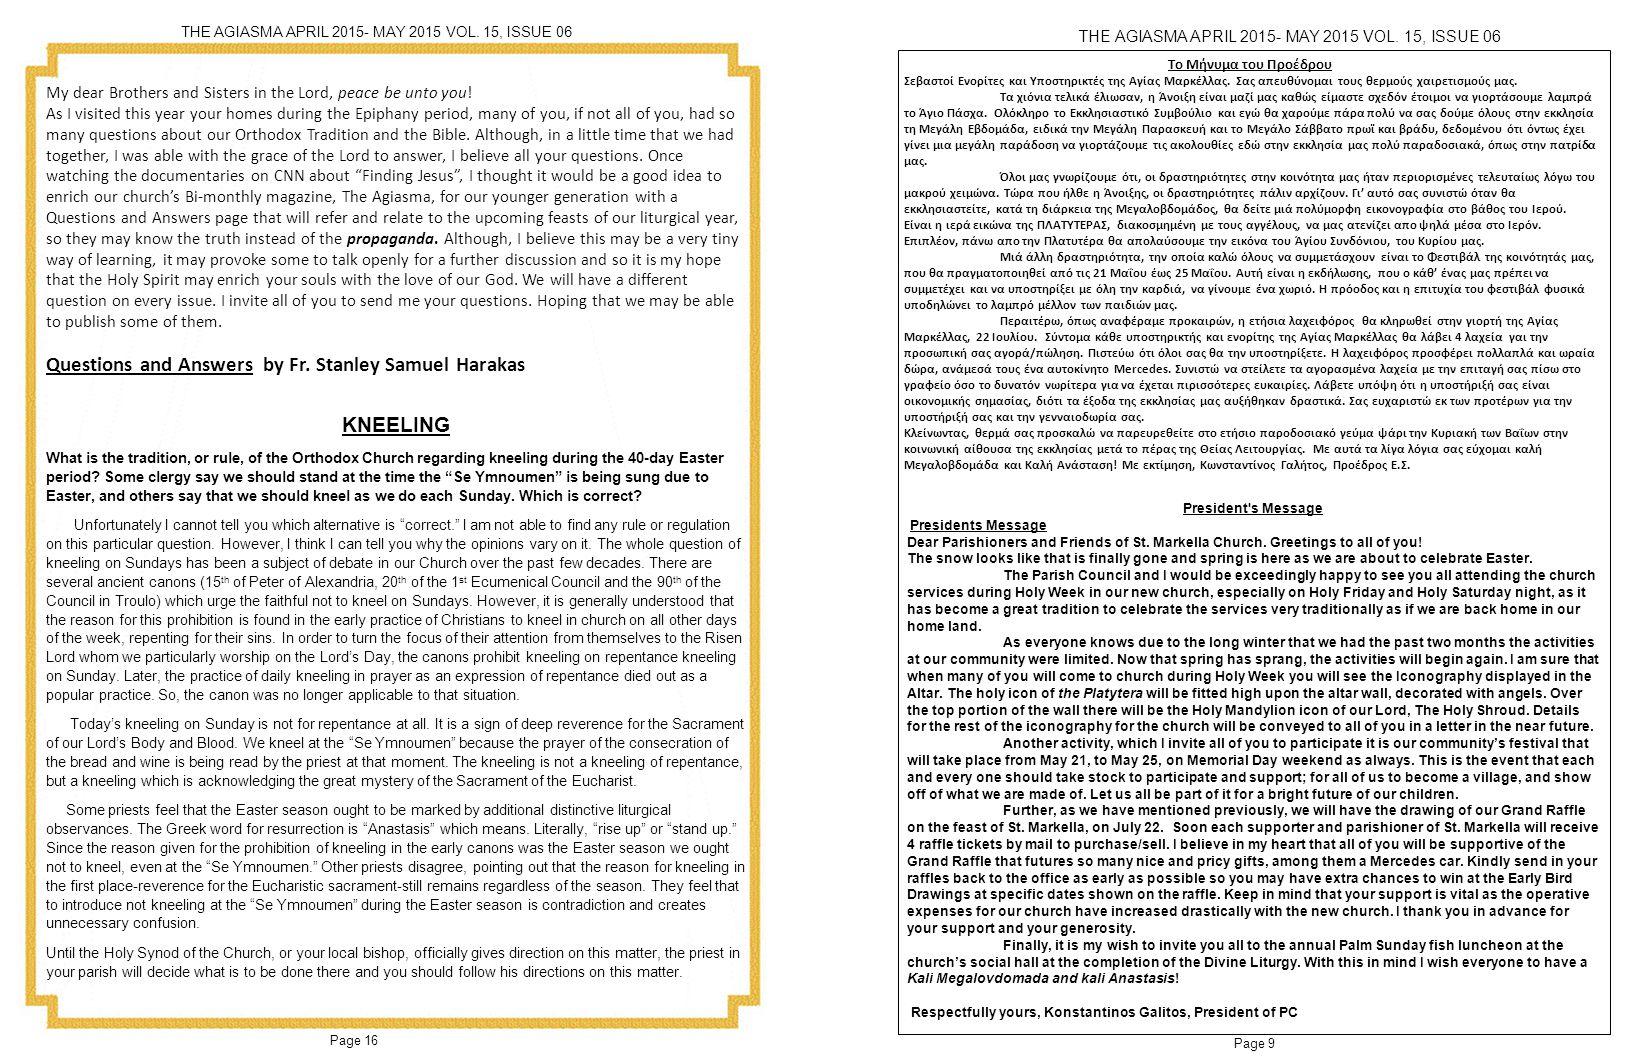 Page 10 Page 15 THE AGIASMA APRIL 2015- MAY 2015 VOL.